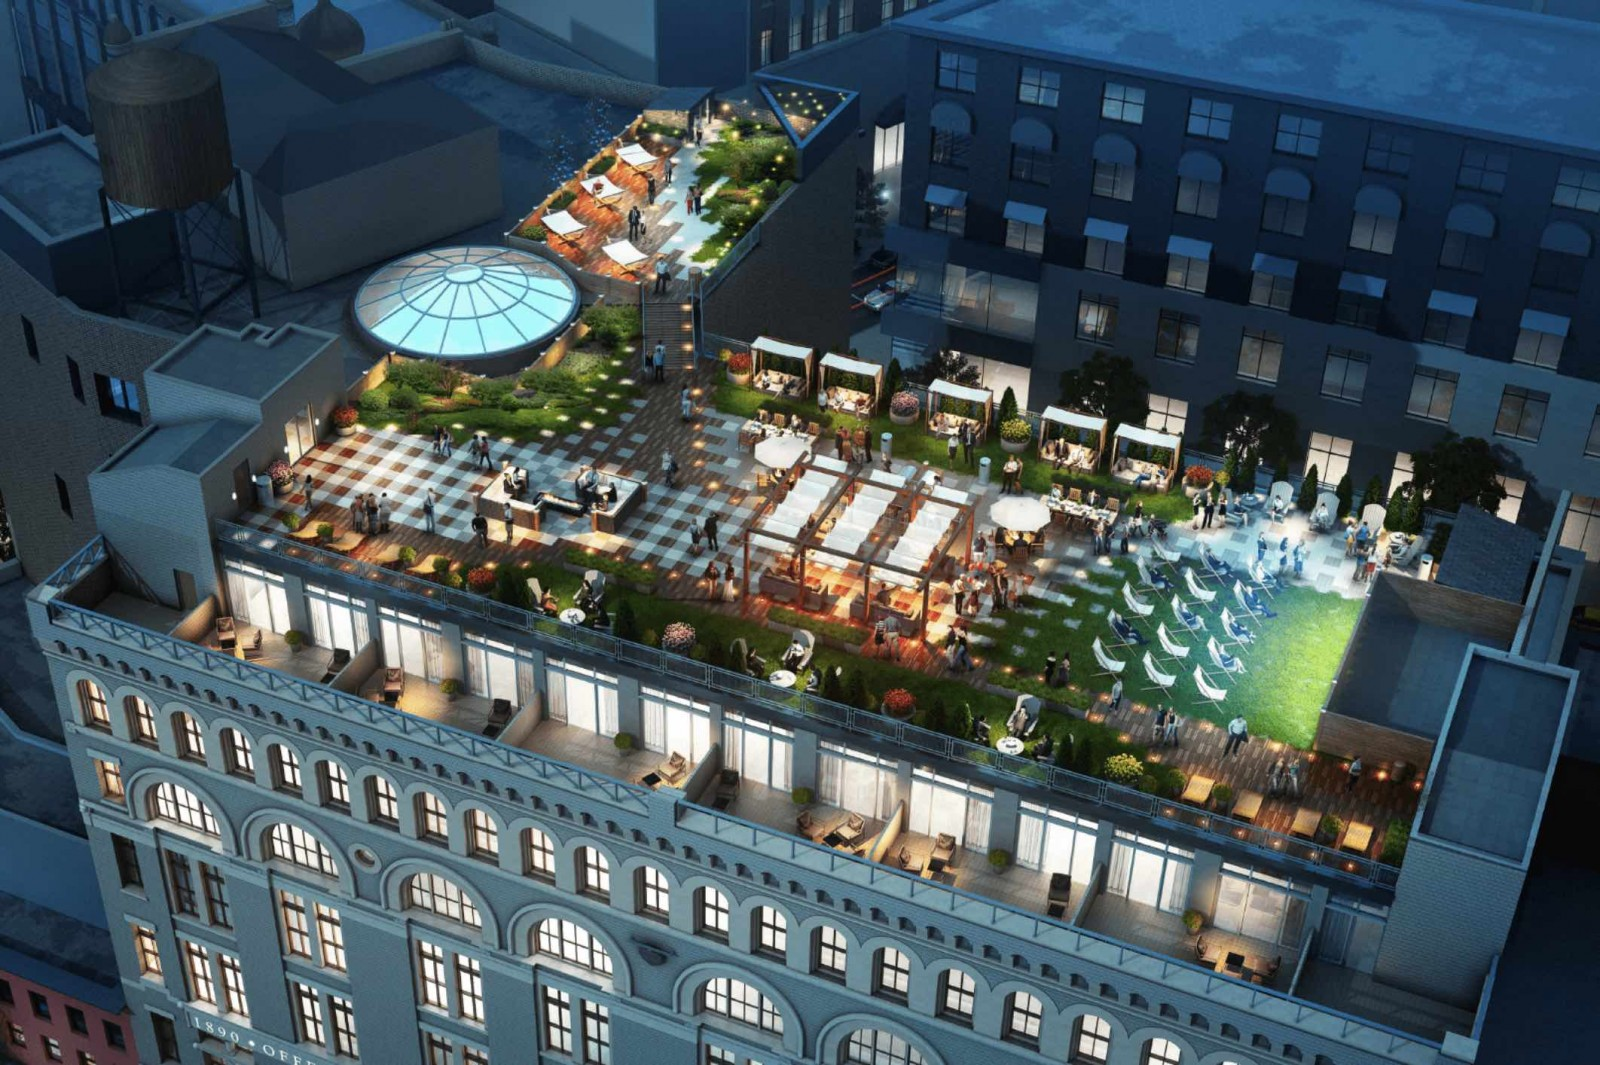 roof-decks-nyc-rooftop-decking